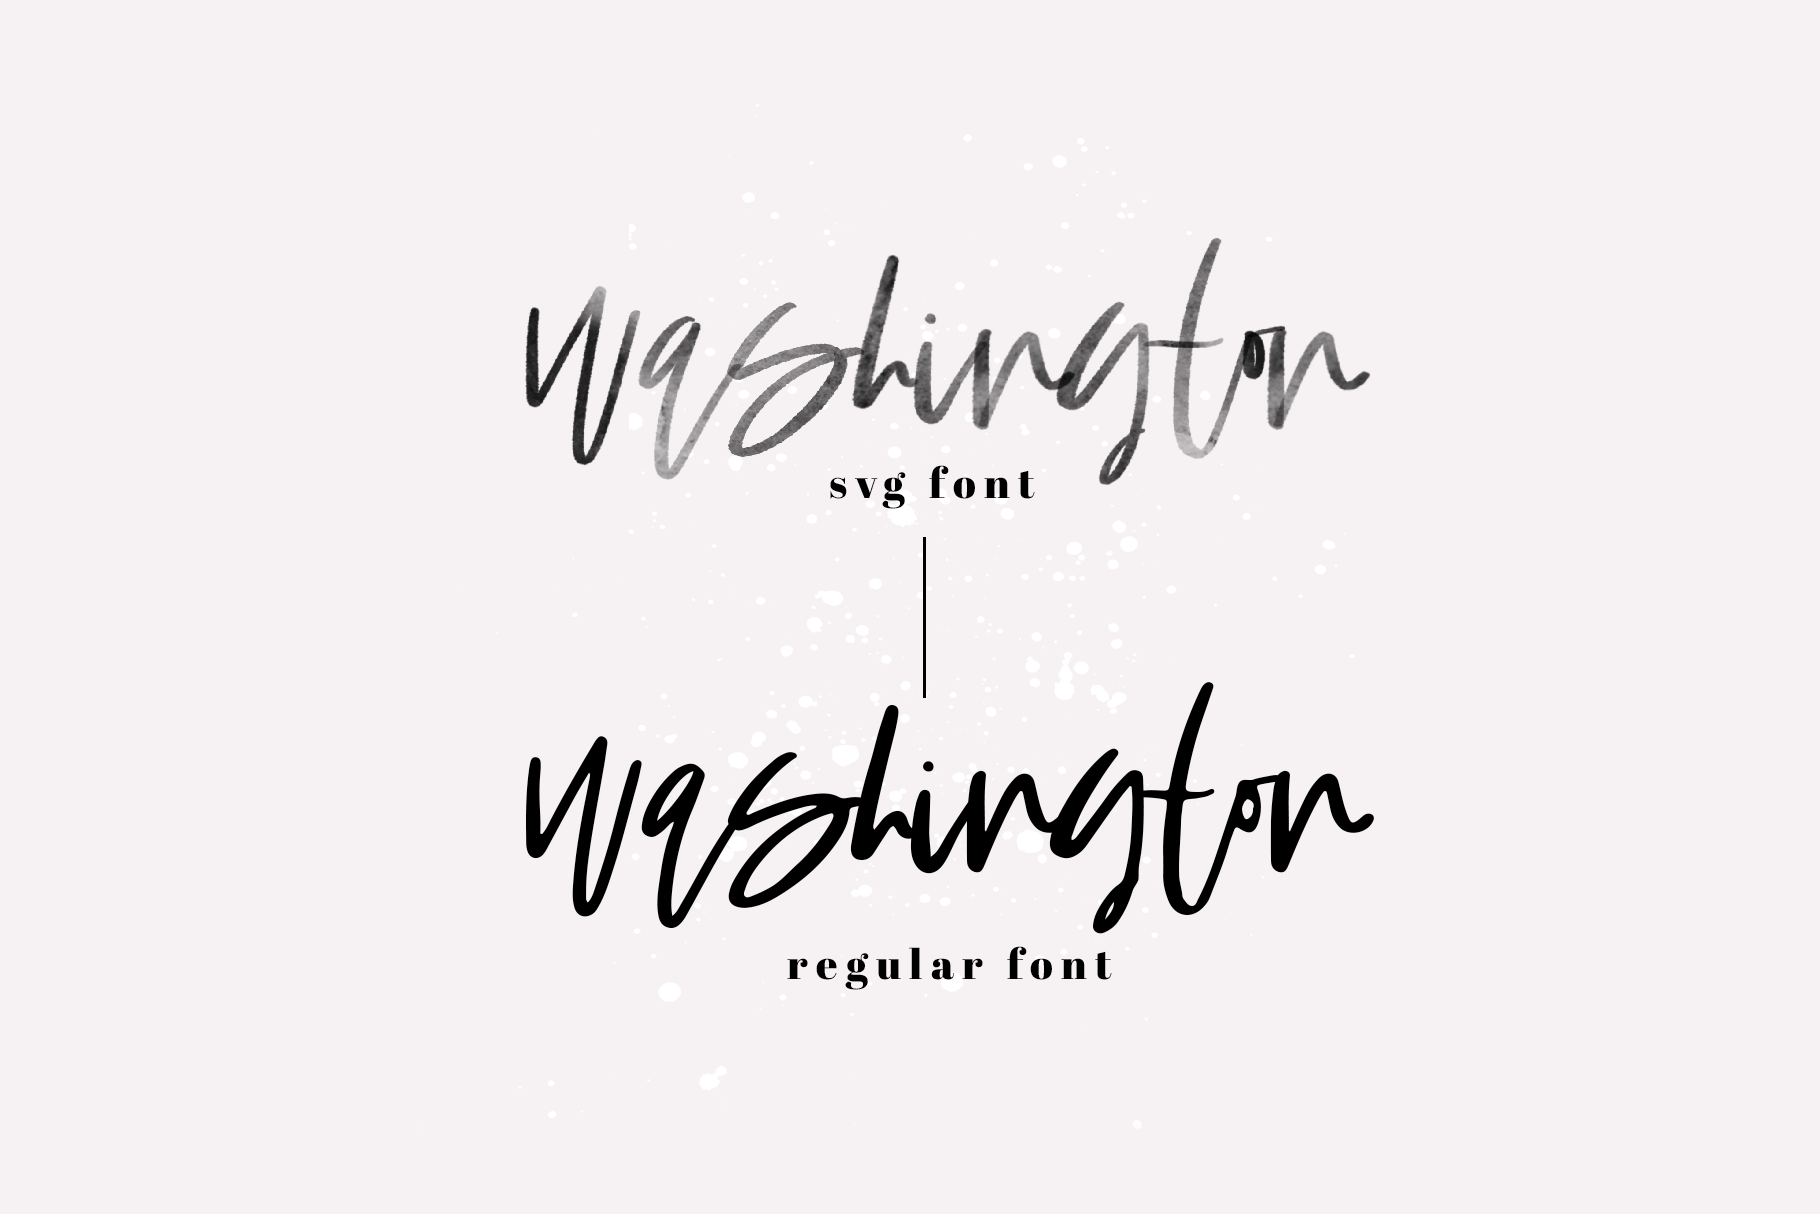 Washington A Handwritten Script Font Svg Solid By Ka Designs